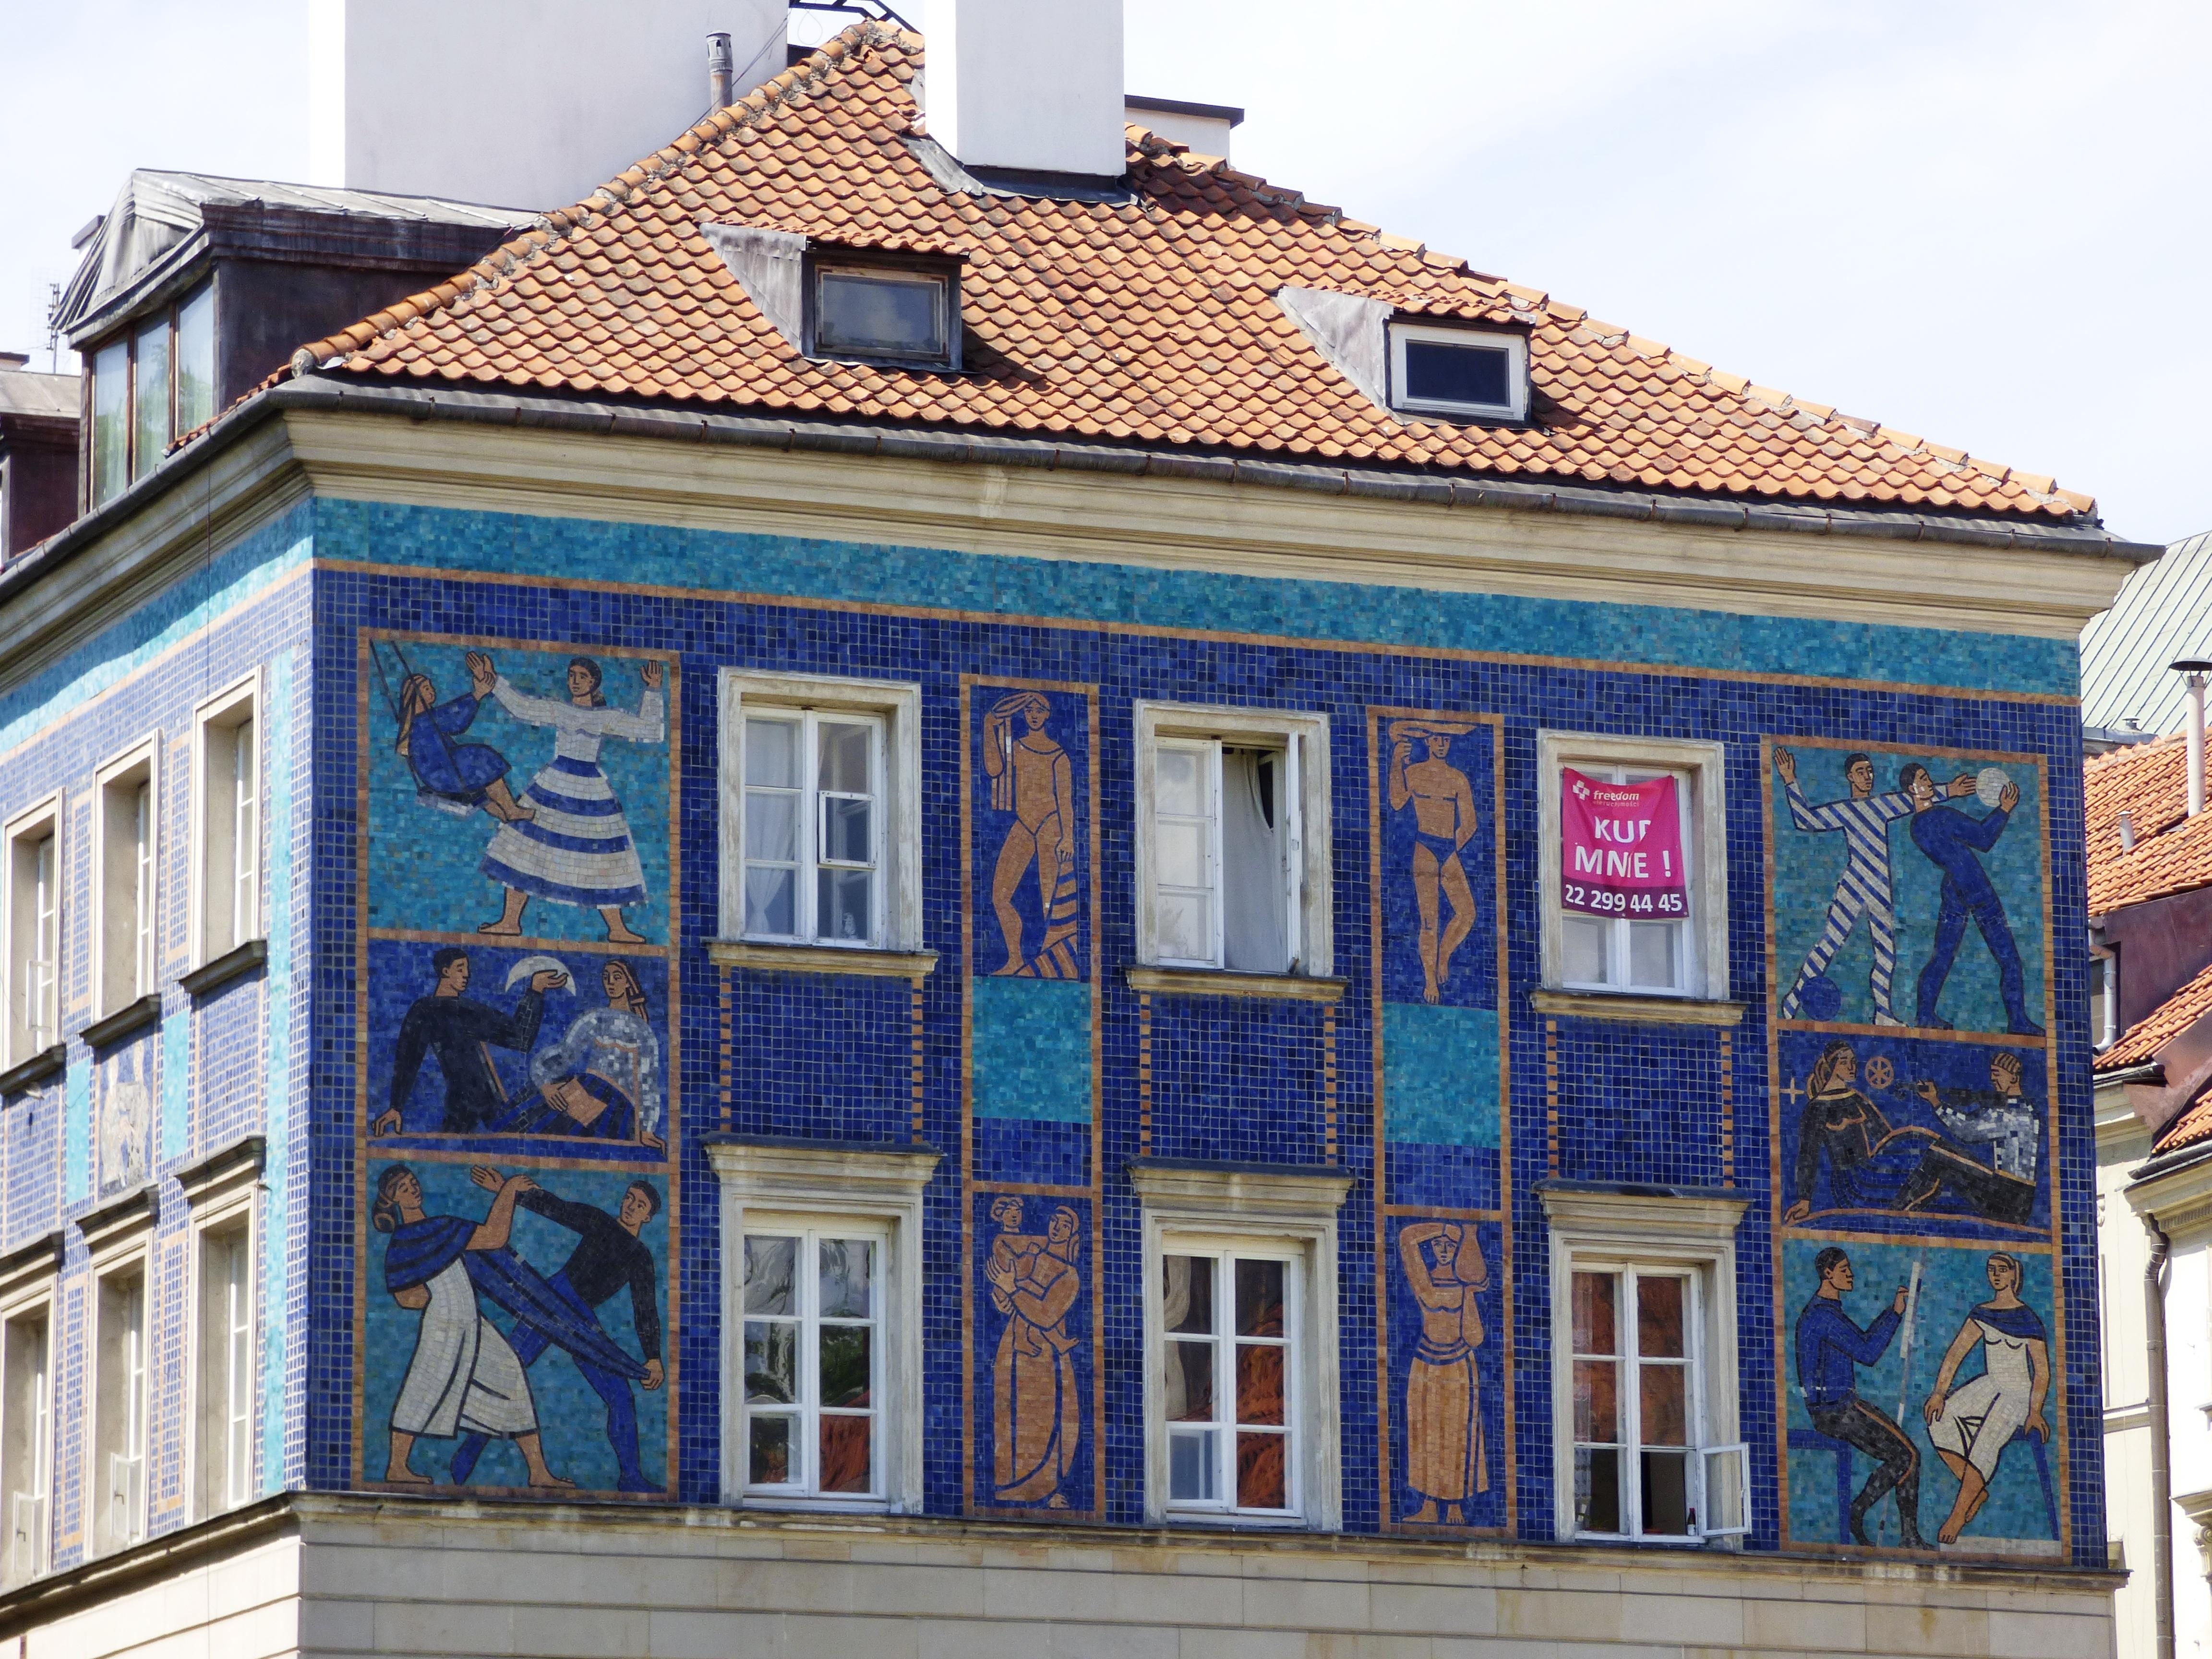 Fotos gratis arquitectura calle antiguo edificio for Fachadas de casas de pueblo